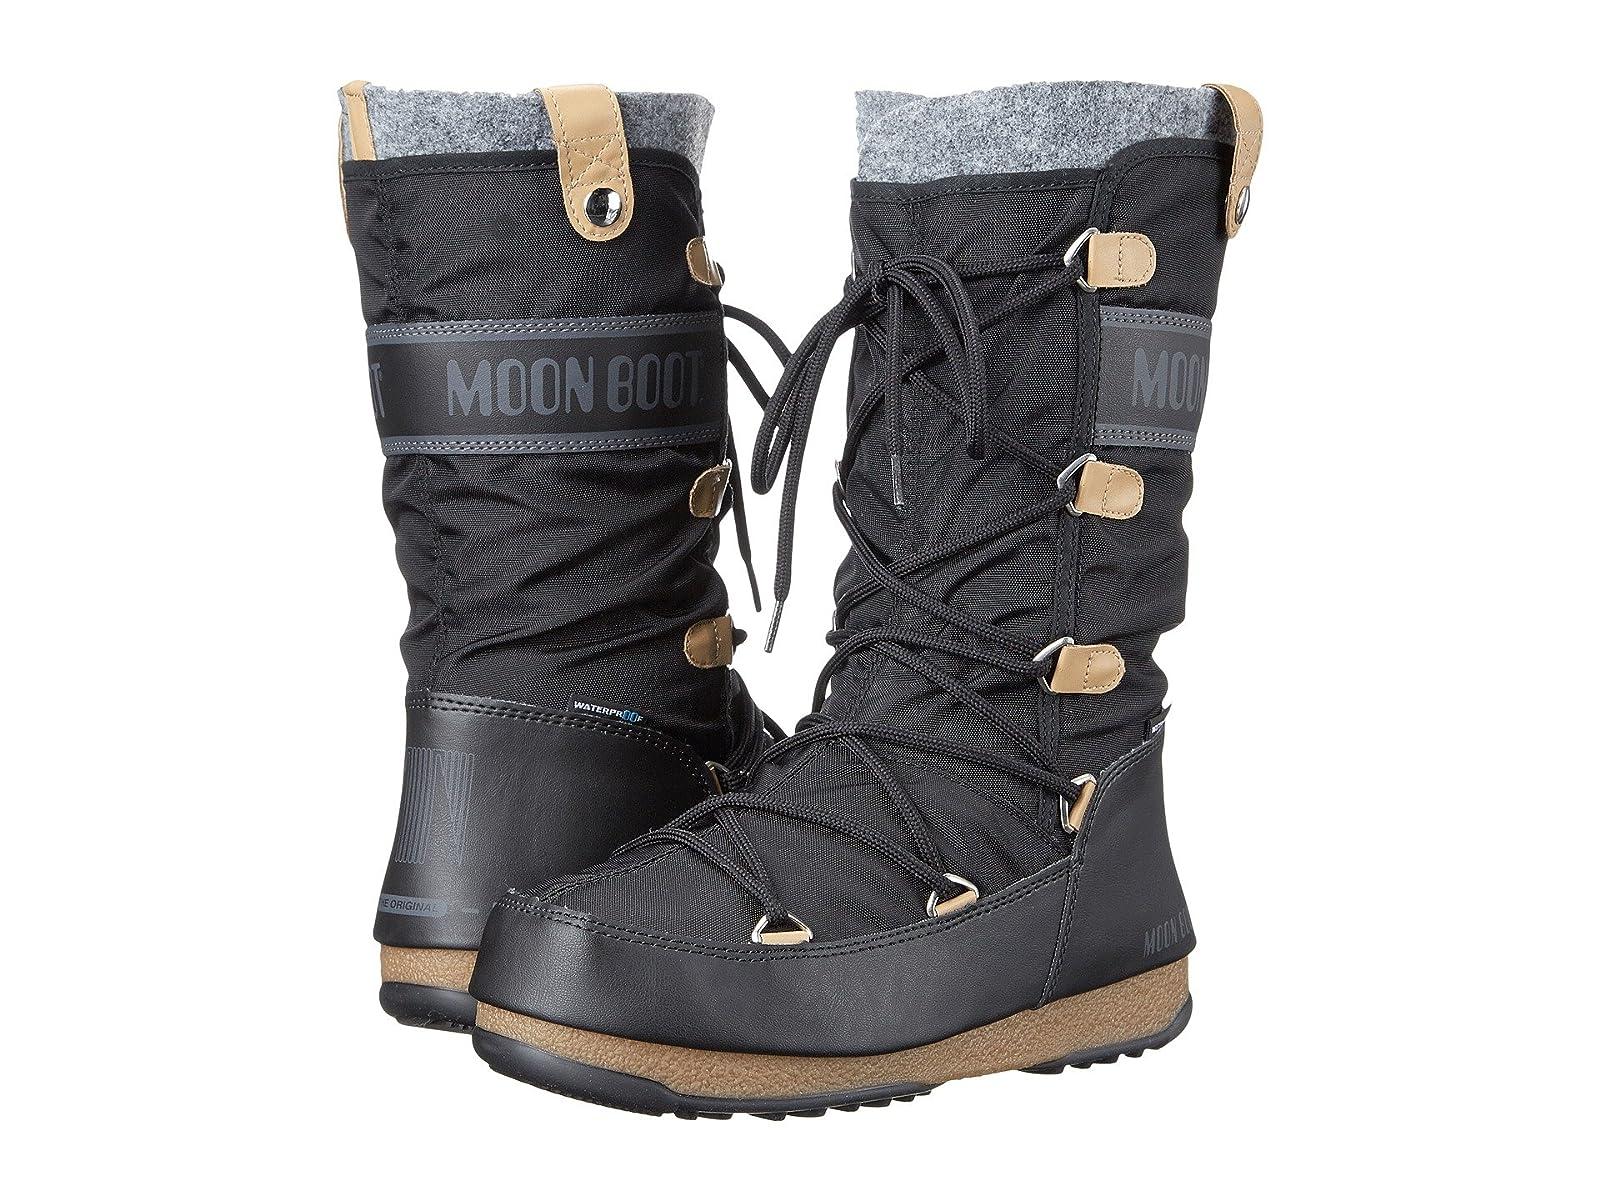 Tecnica Moon Boot® Monaco FeltEconomical and quality shoes